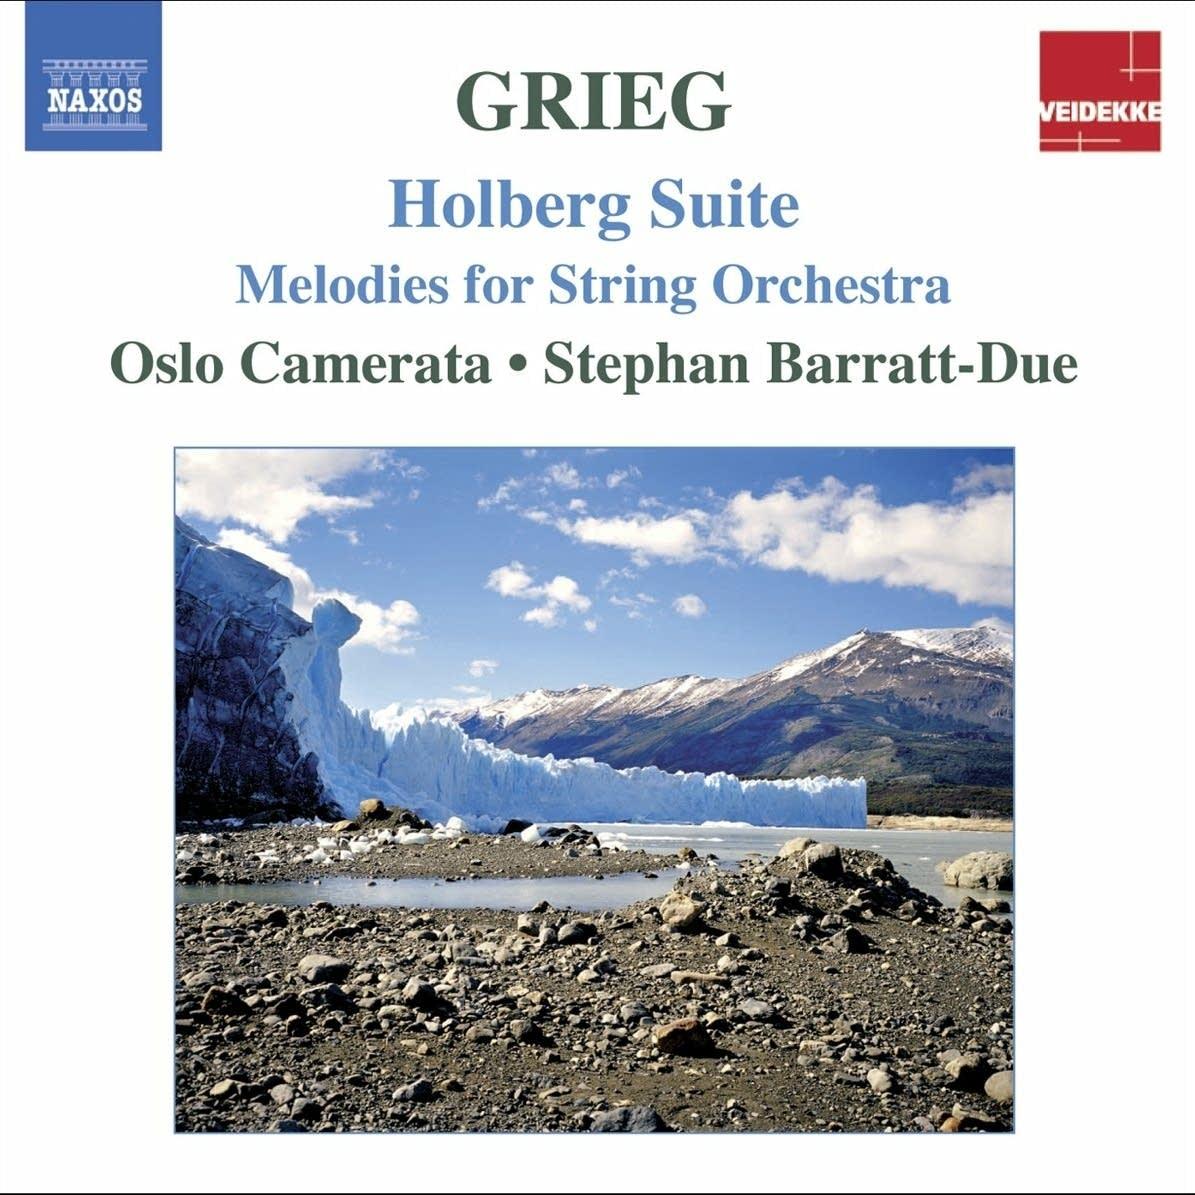 Edvard Grieg - 2 Elegiac Melodies: No. 1 The Wounded Heart